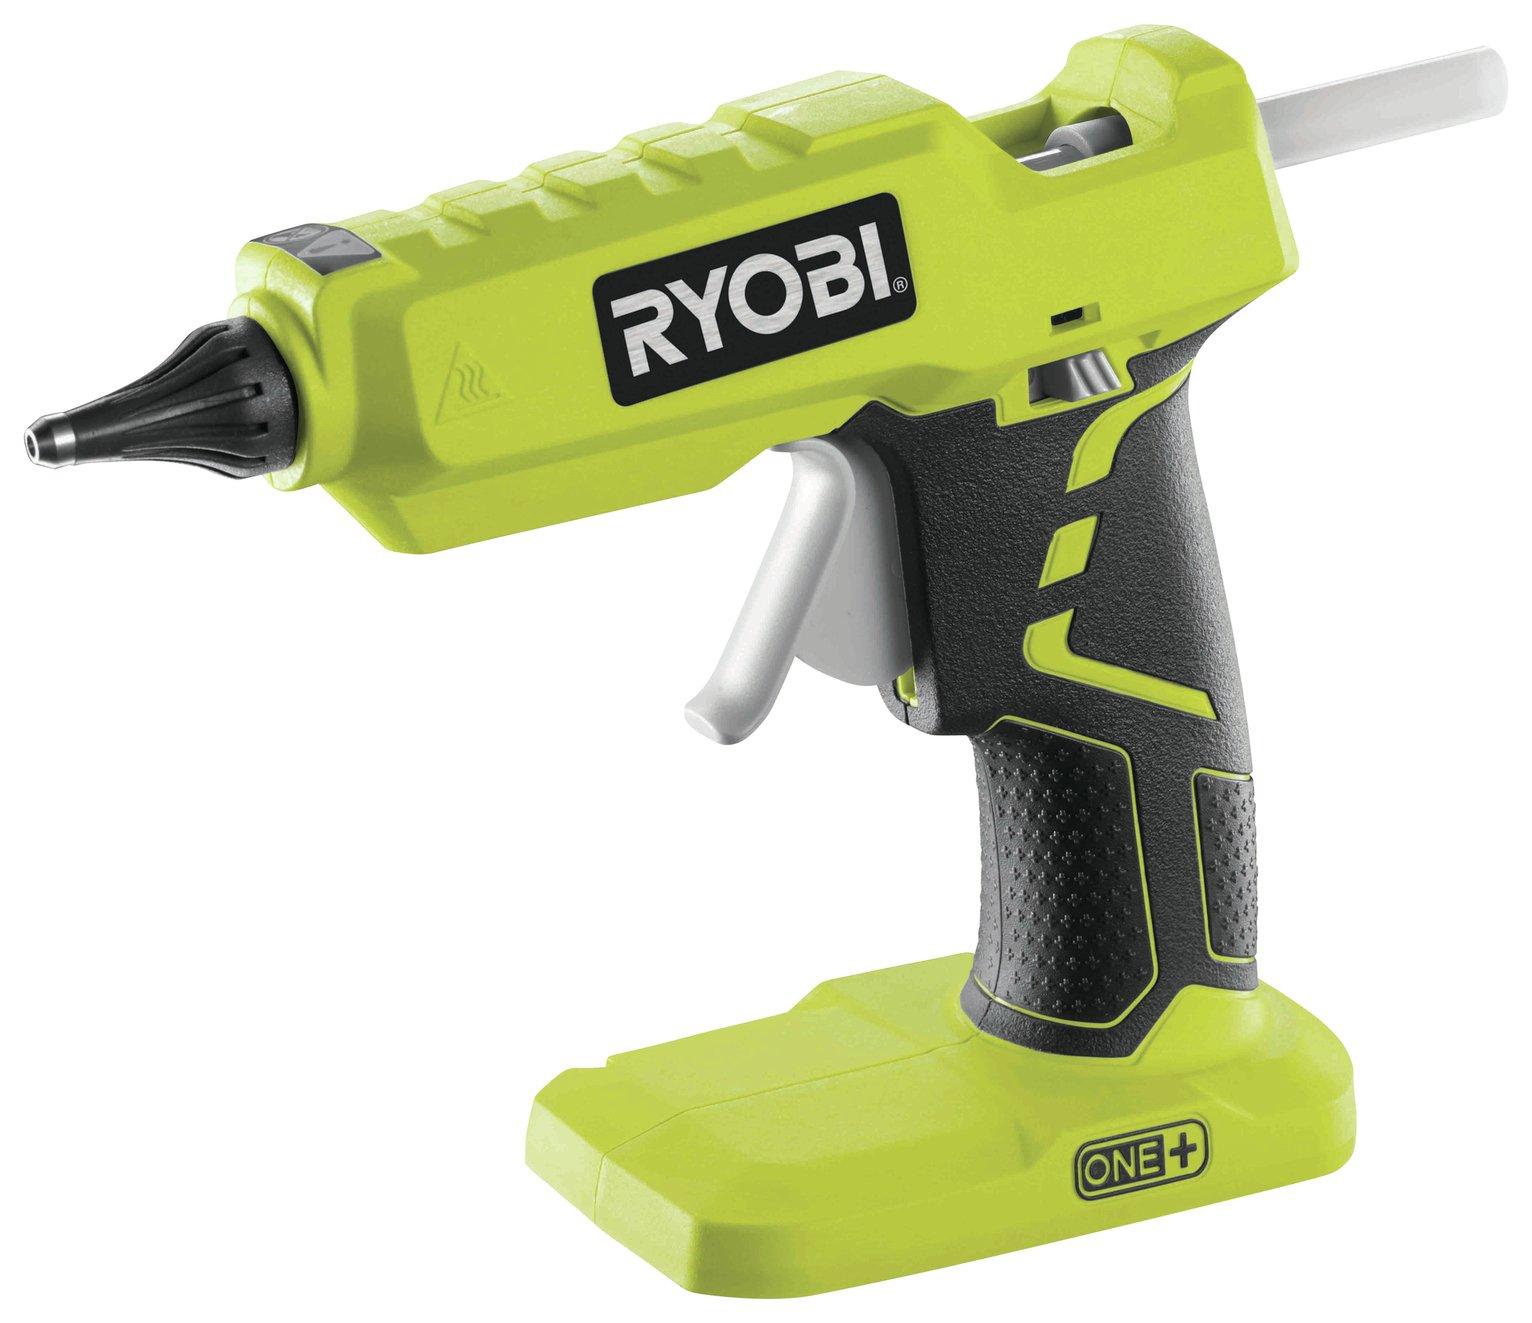 Ryobi R18GLU-0 Glue Gun Bare Tool - 18V